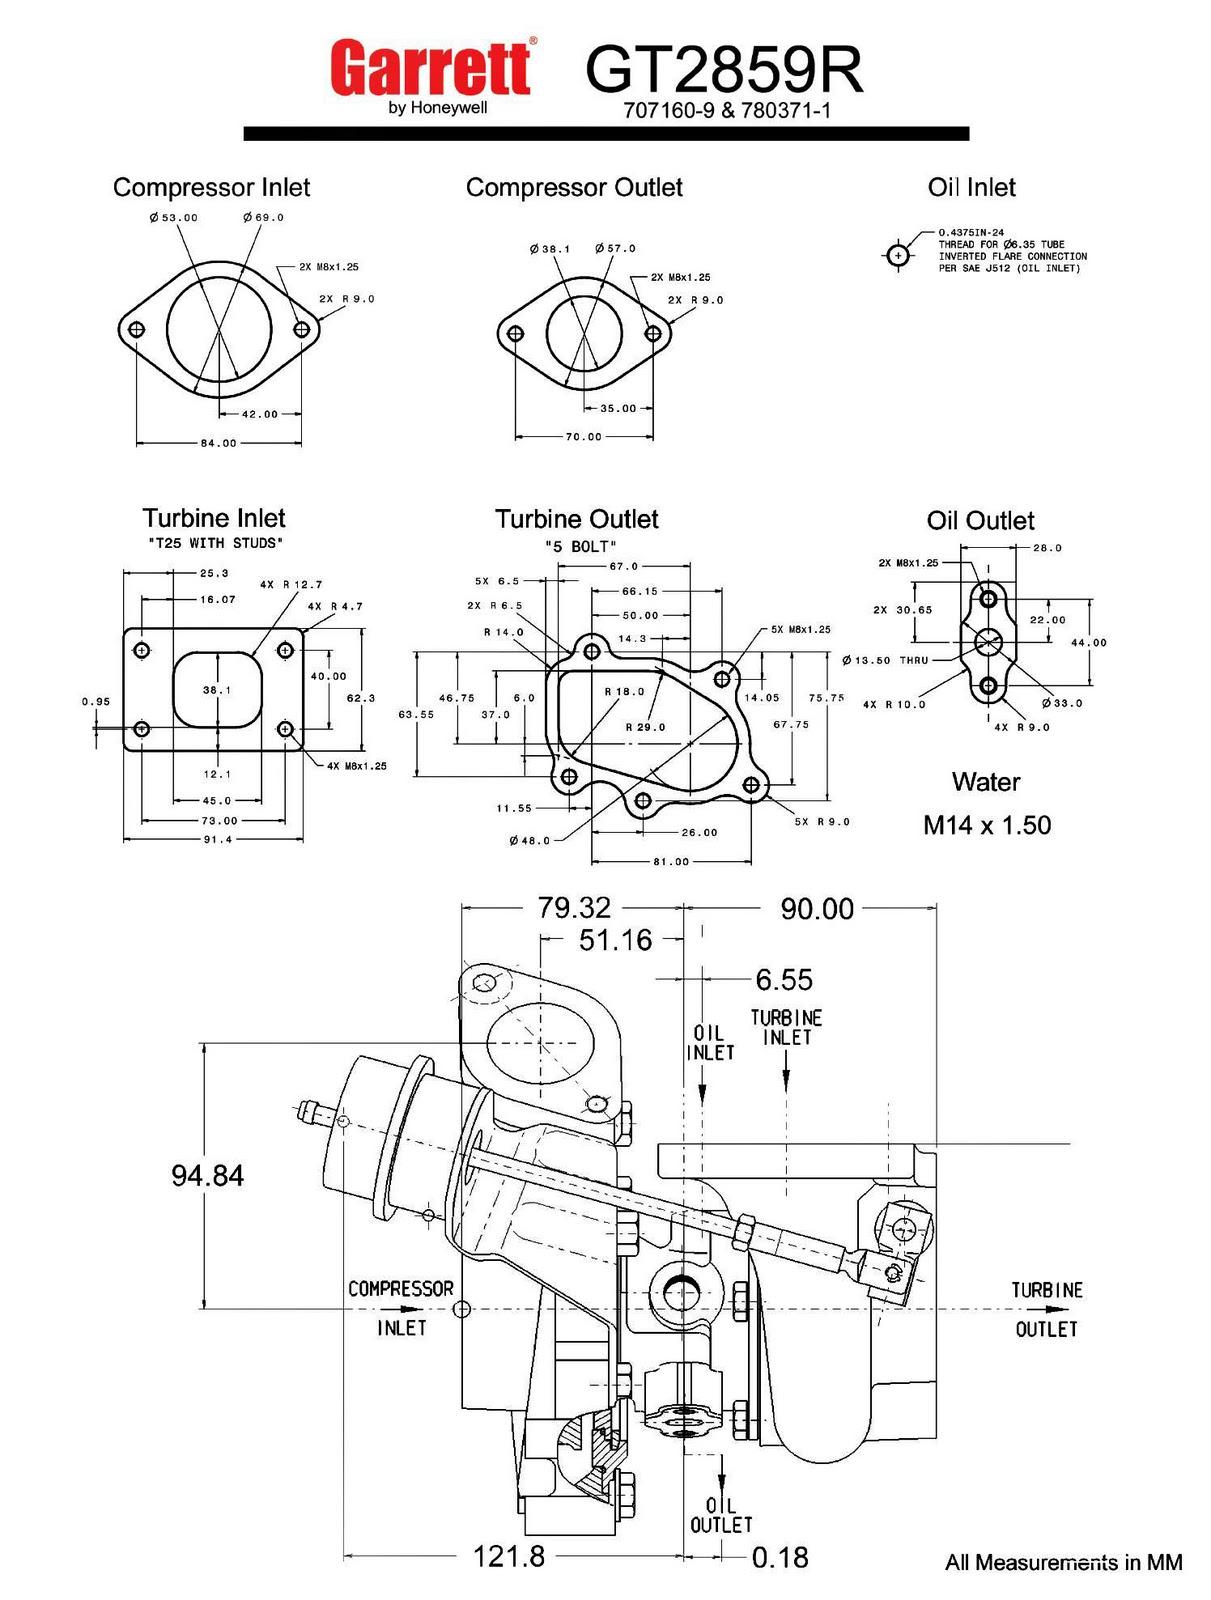 medium resolution of garrett gt28r turbo gt2859r dual ball bearing measurements in mm turbocharger flanges diameter turbo flange honeywell 1496x1977